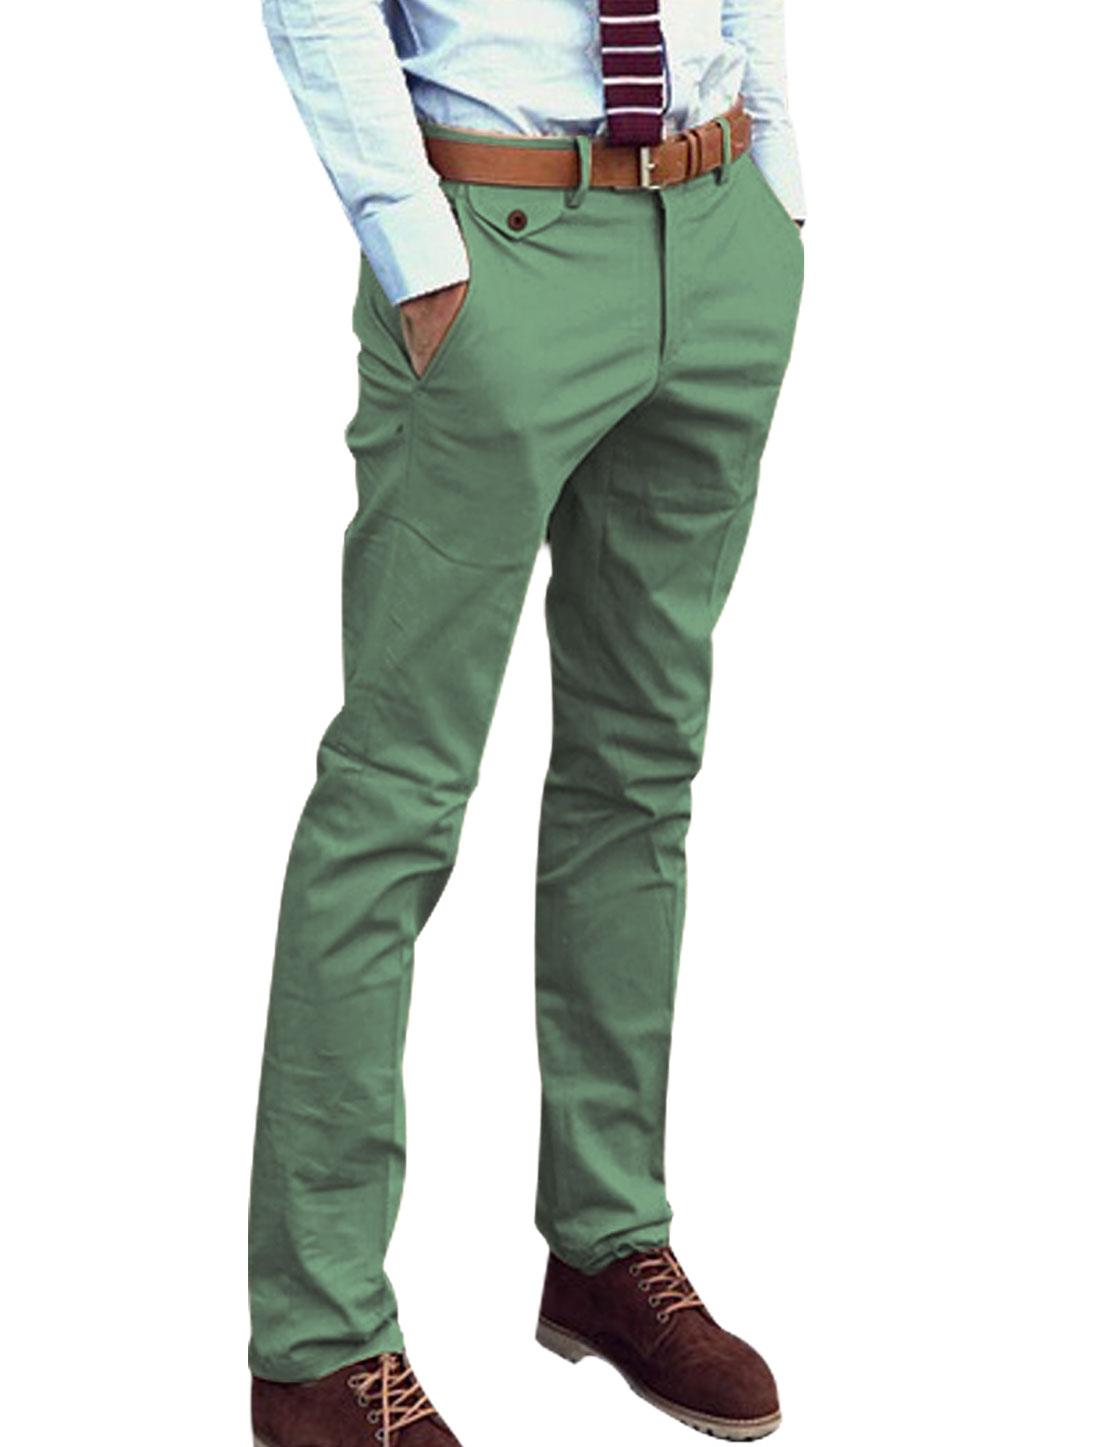 Man's Belt Loop Mid Rise Slant Front Pockets Casual Pants Khaki Green W30